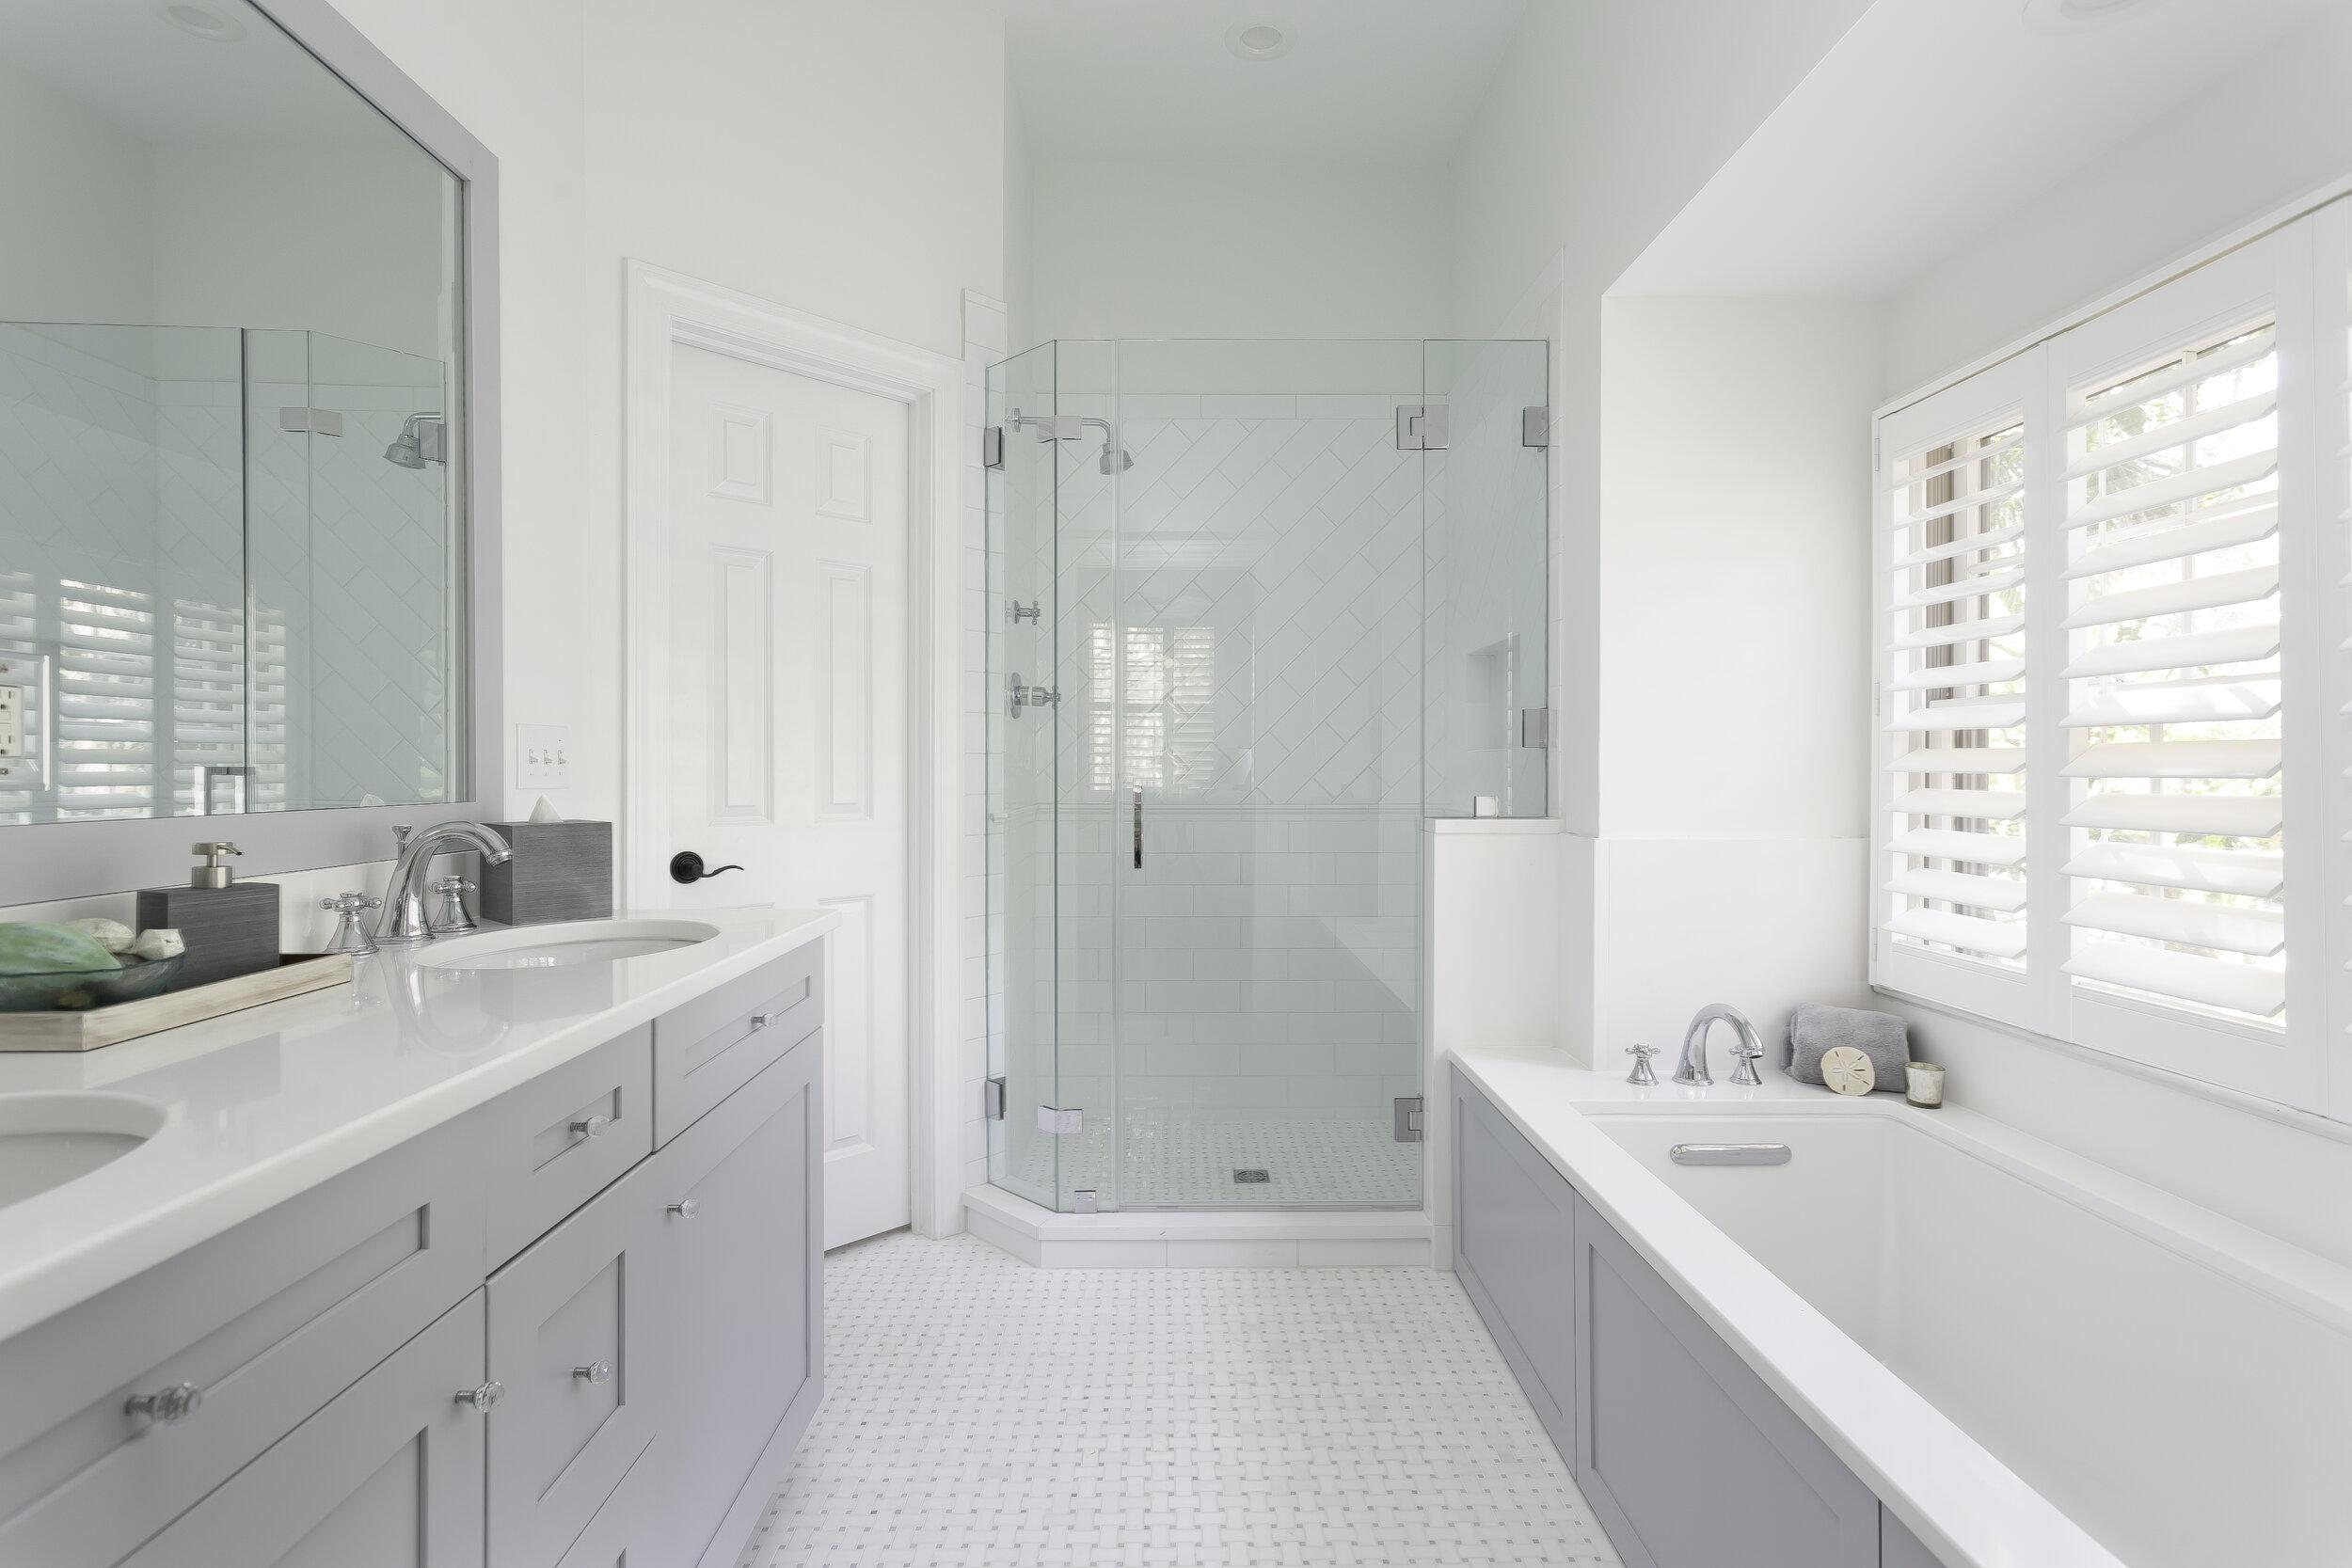 Southeast Kitchens Cabinets Kitchen, Bathroom Remodel Charleston Sc